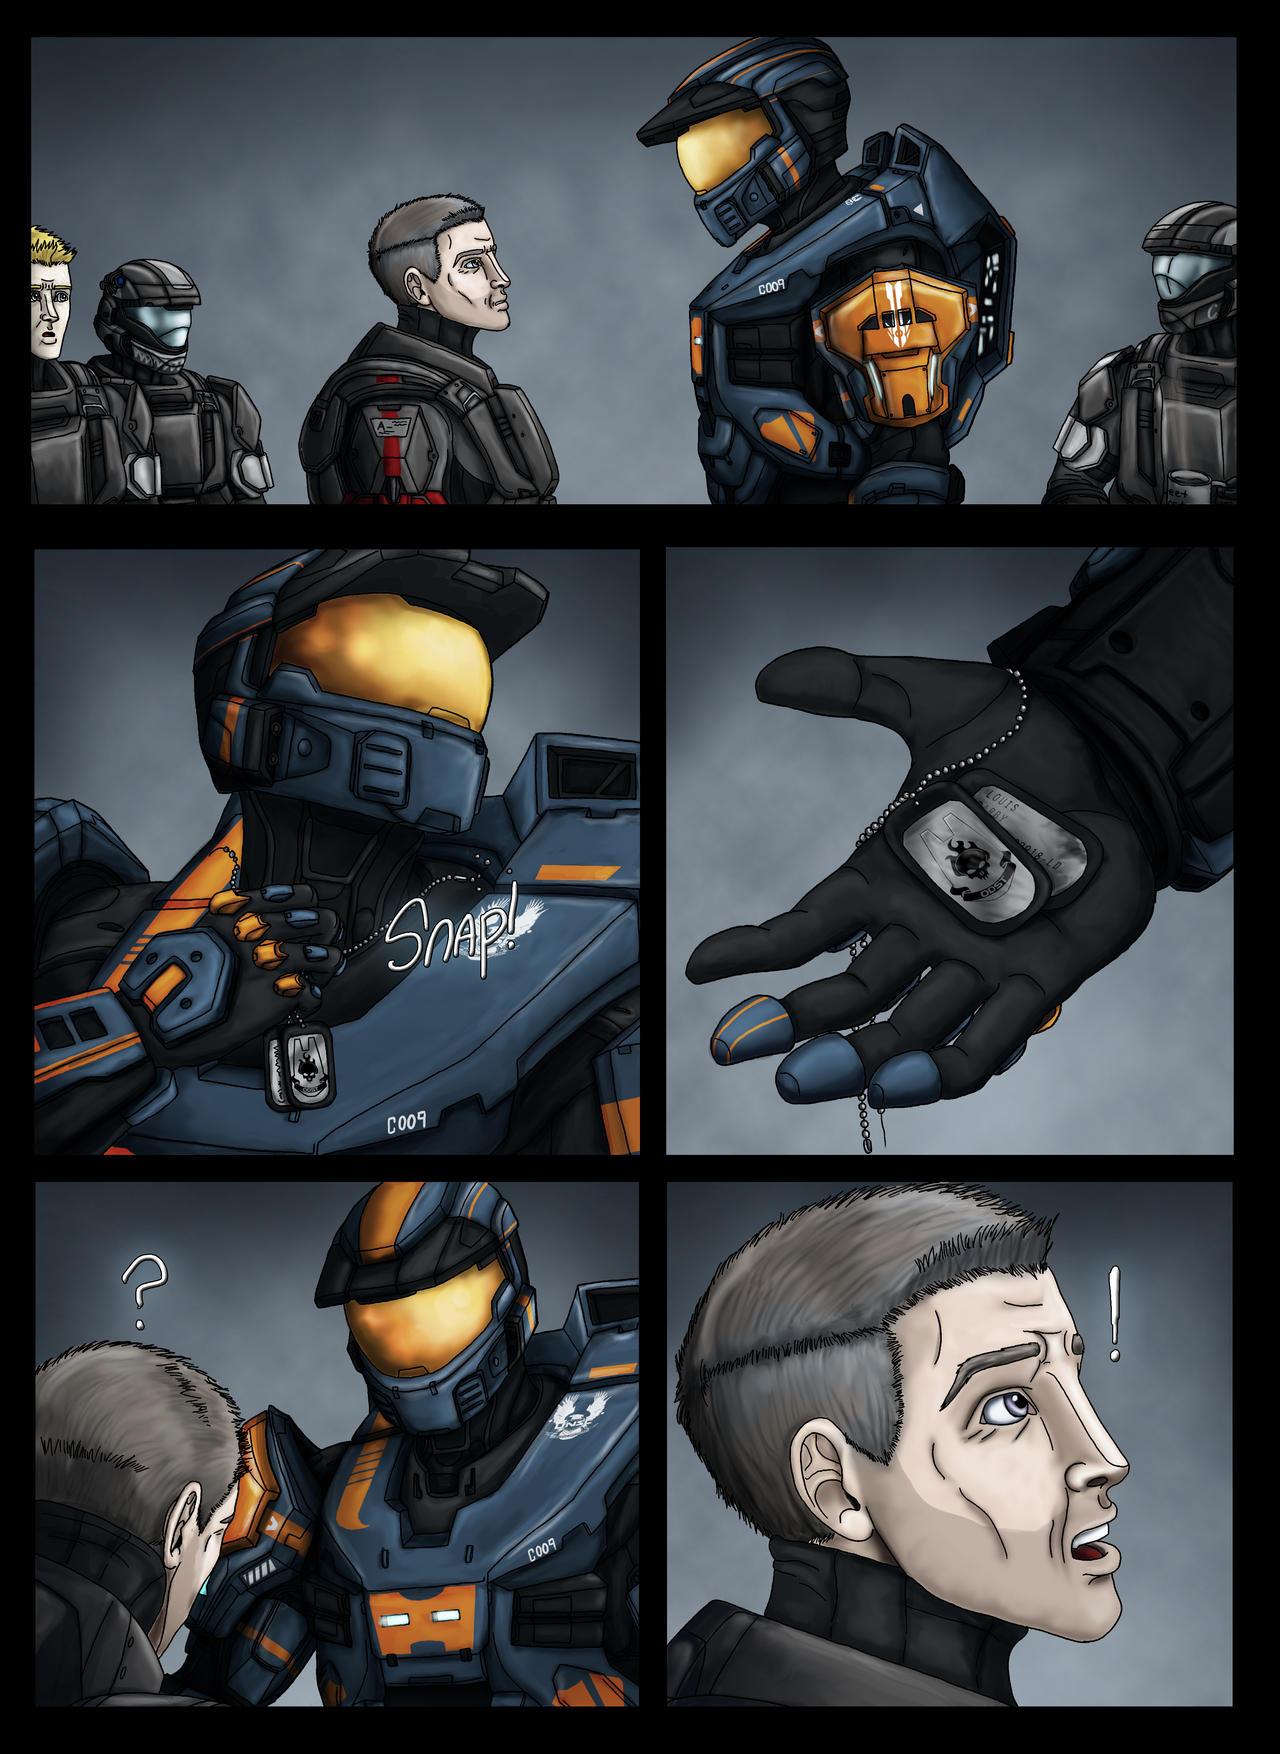 My Halo Related Art (Armor/Comics/etc...) | Community